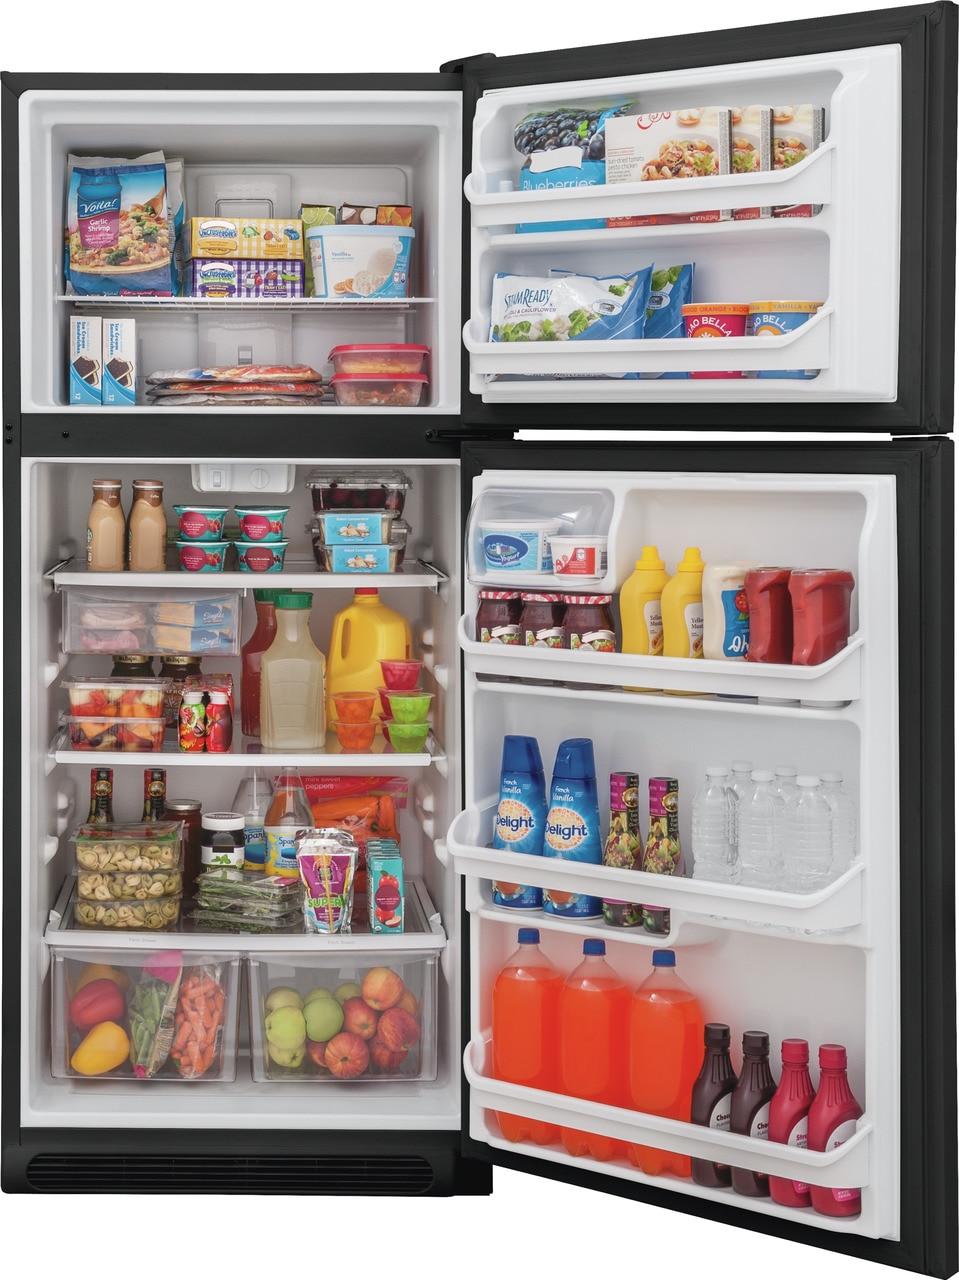 Model: FFTR2021TB | Frigidaire 20.4 Cu. Ft. Top Freezer Refrigerator